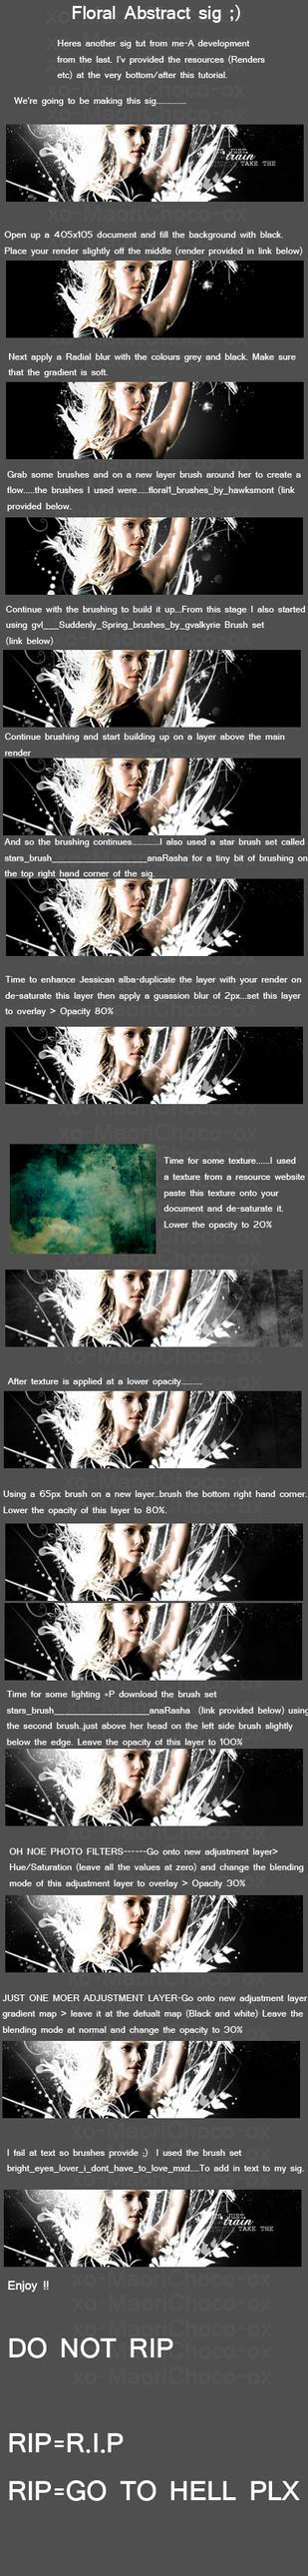 Jessica alba sig tut by xo-MaoriChoco-ox